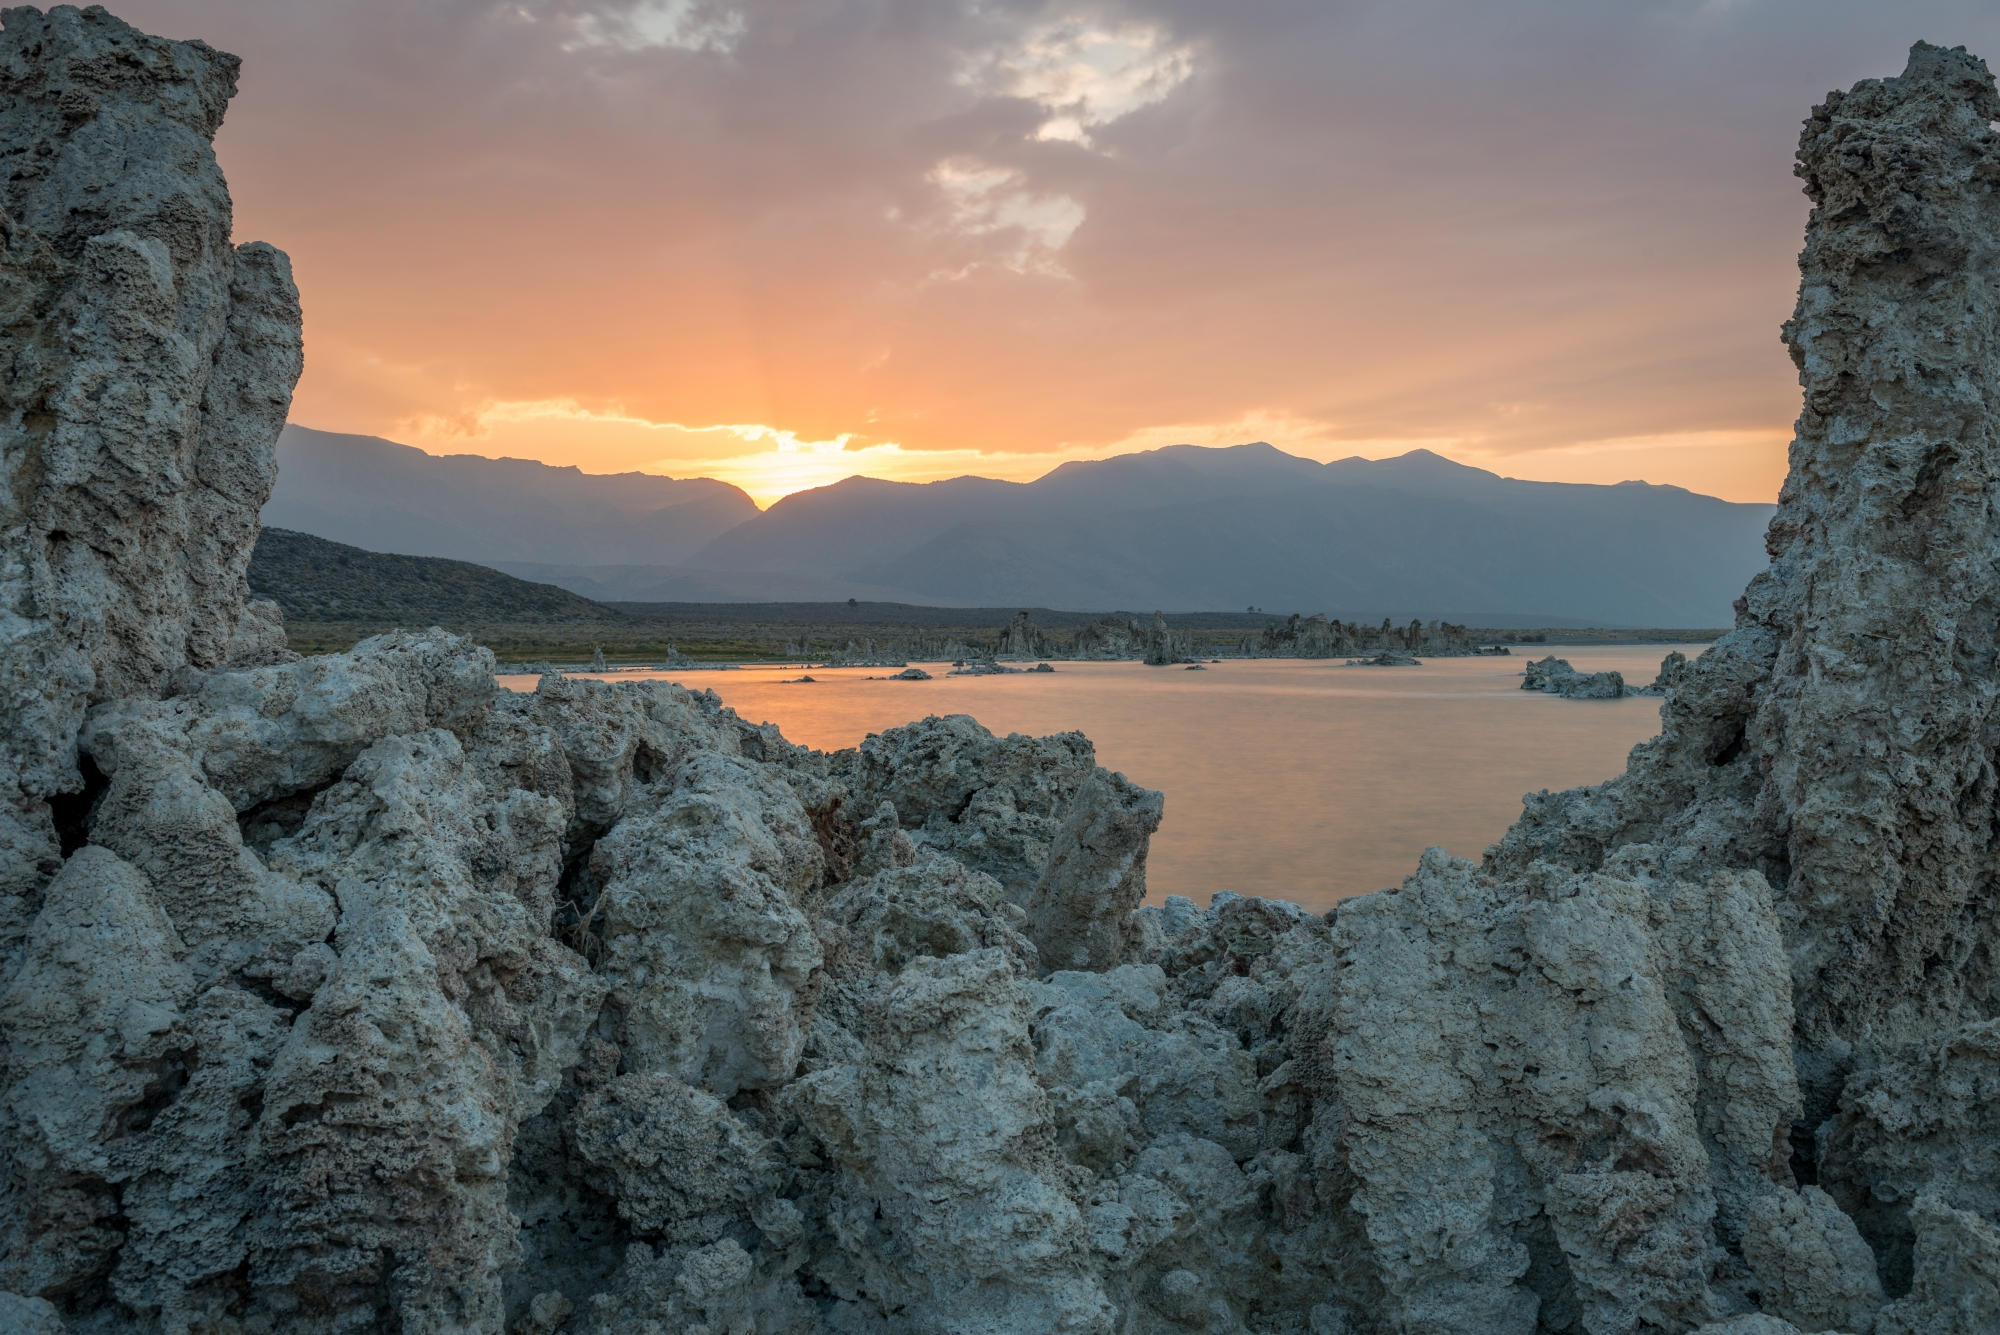 DSC4363 Sunset at Mono Lake, California